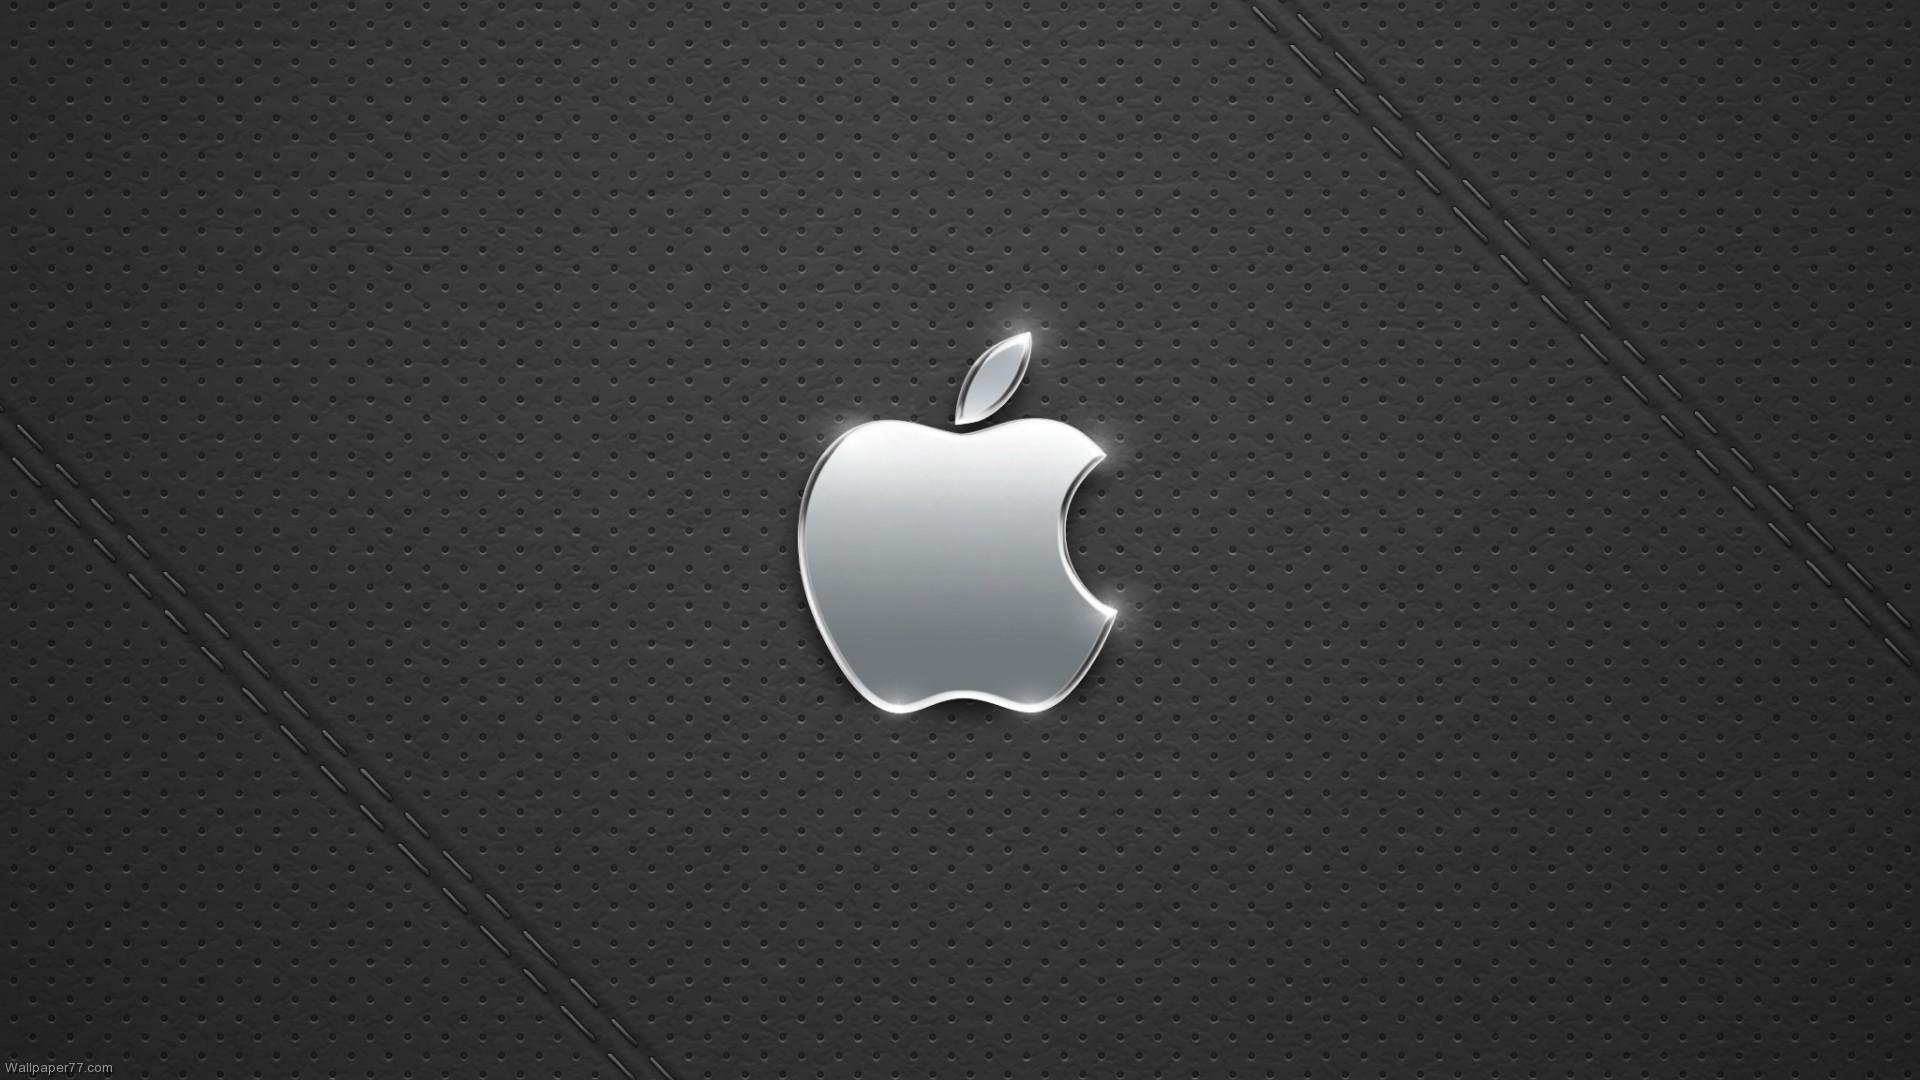 Ipad Retina Wallpaper: Wallpaper For Mac Retina Display